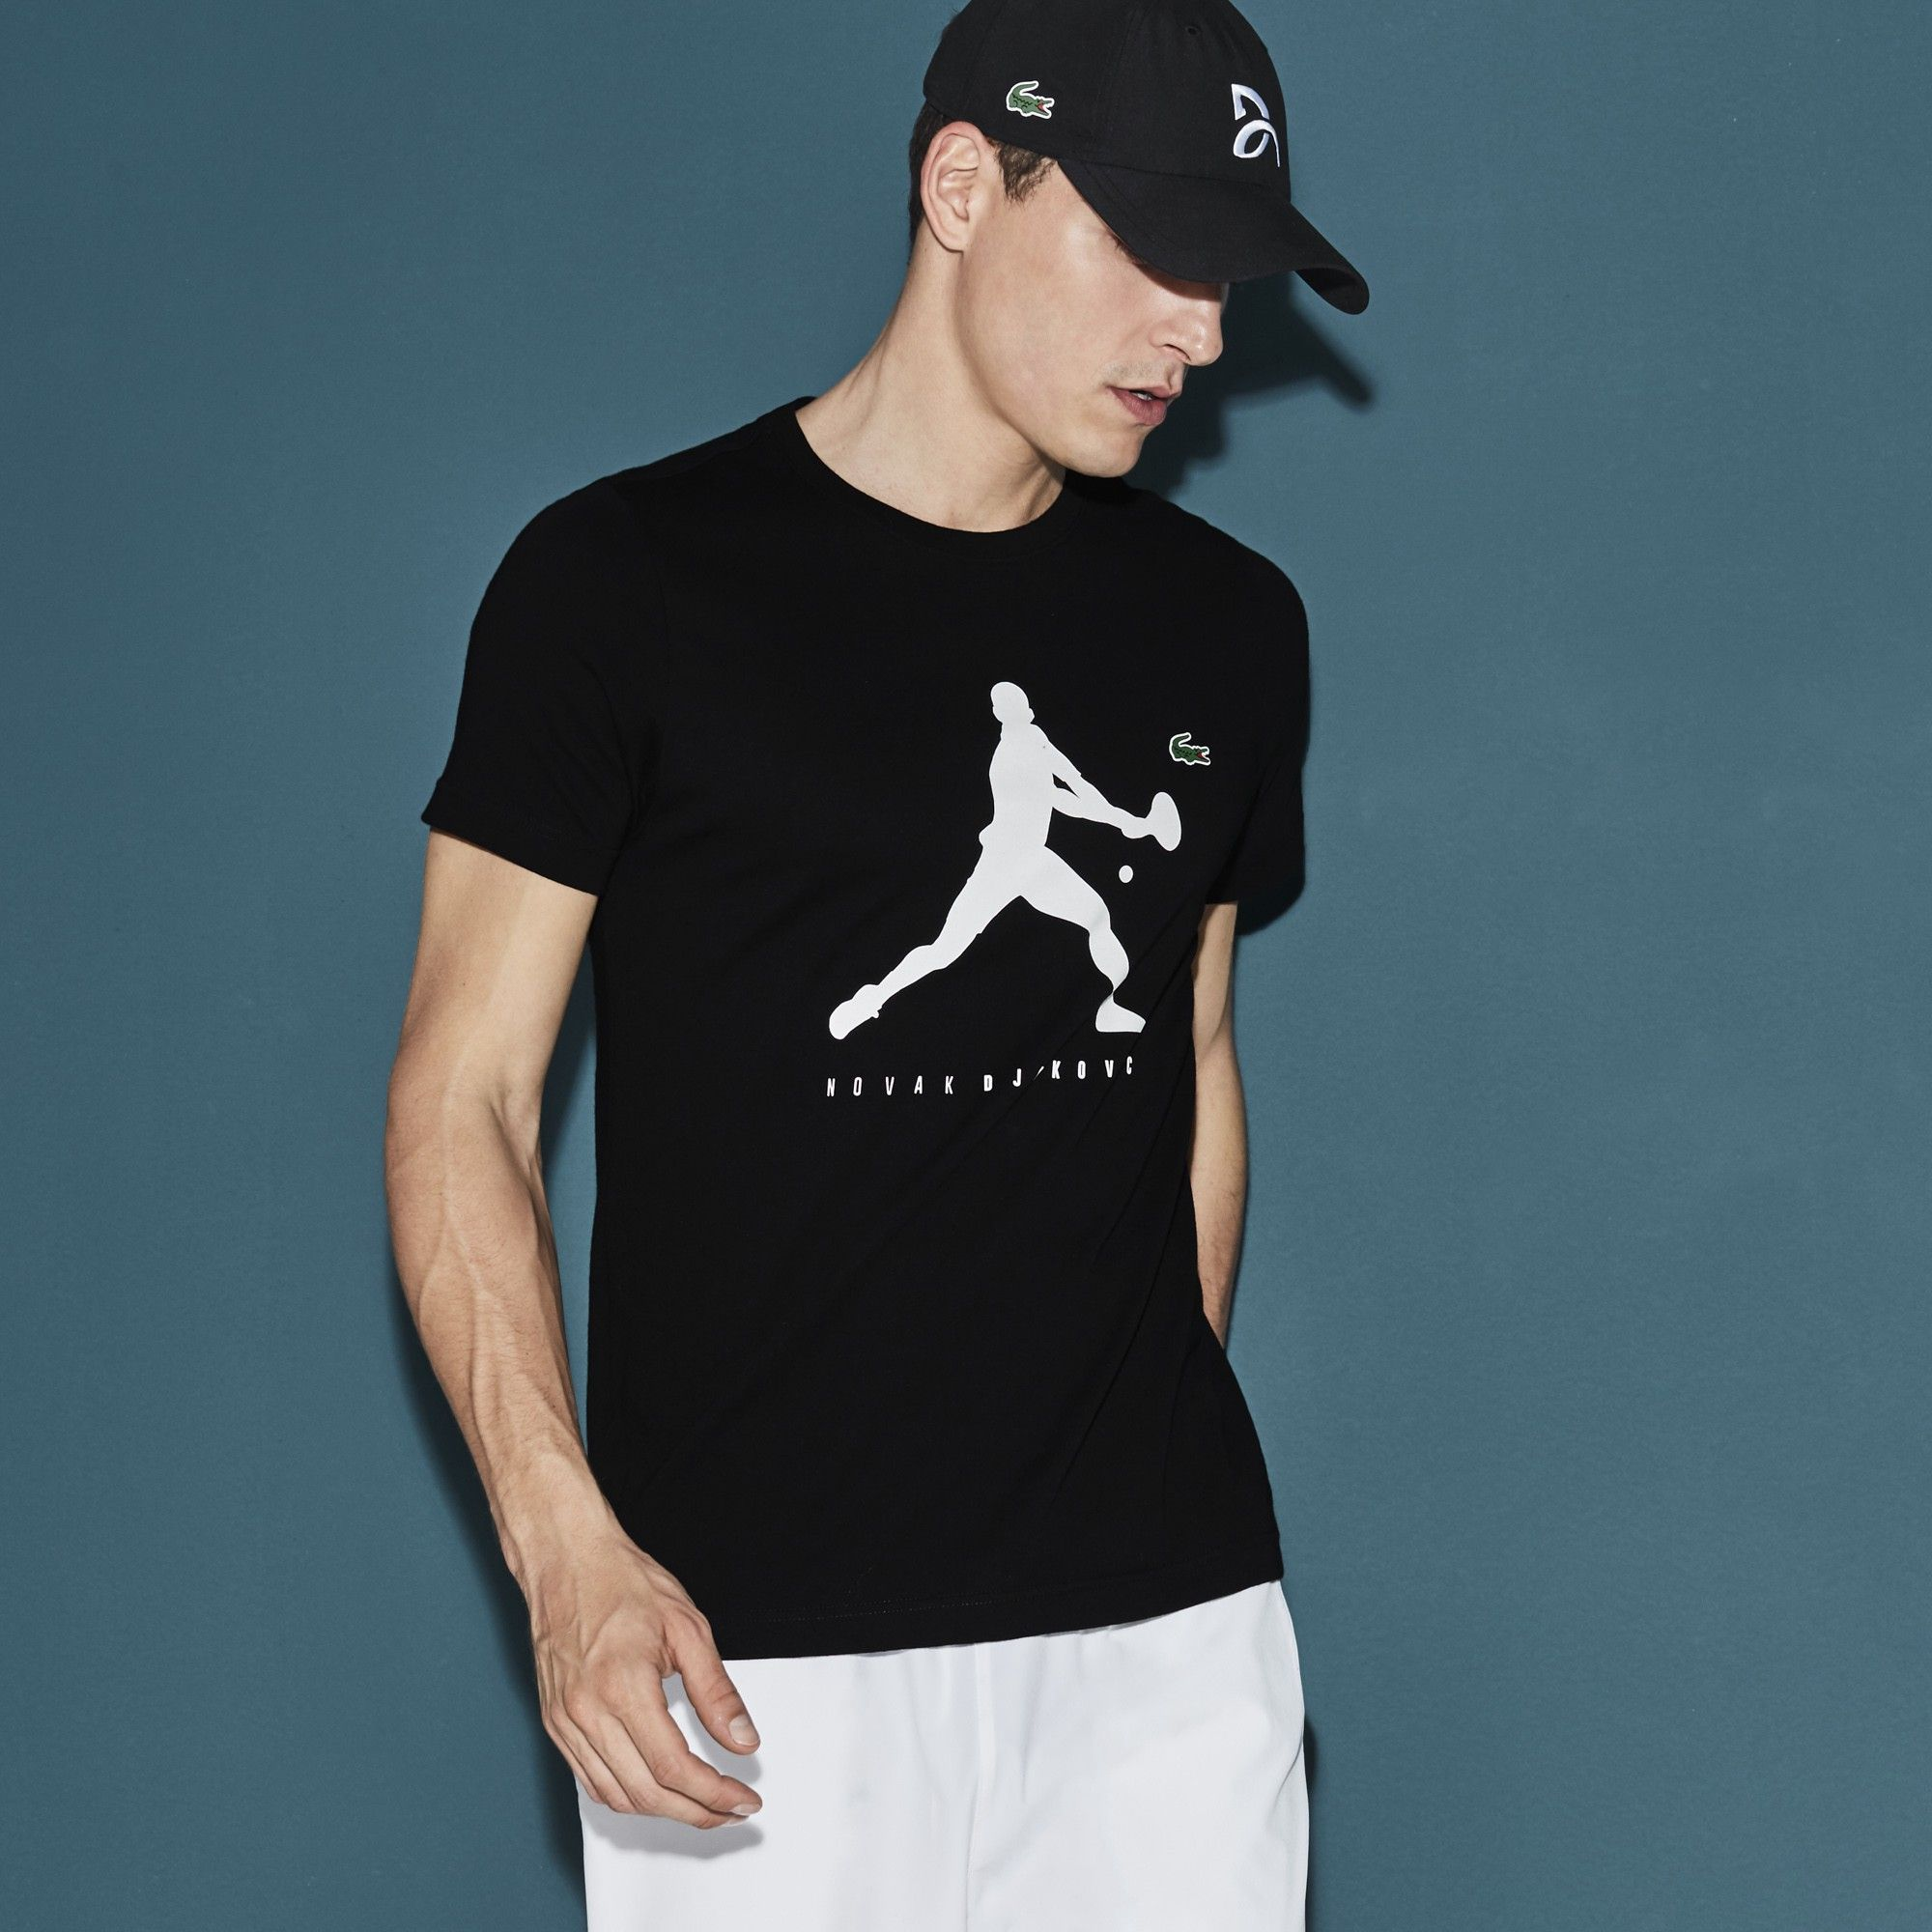 Lacoste Men S Sport Tennis T Shirt Novak Djokovic Supporter Collection In Black Modesens Lacoste Men Tennis Tshirts Men